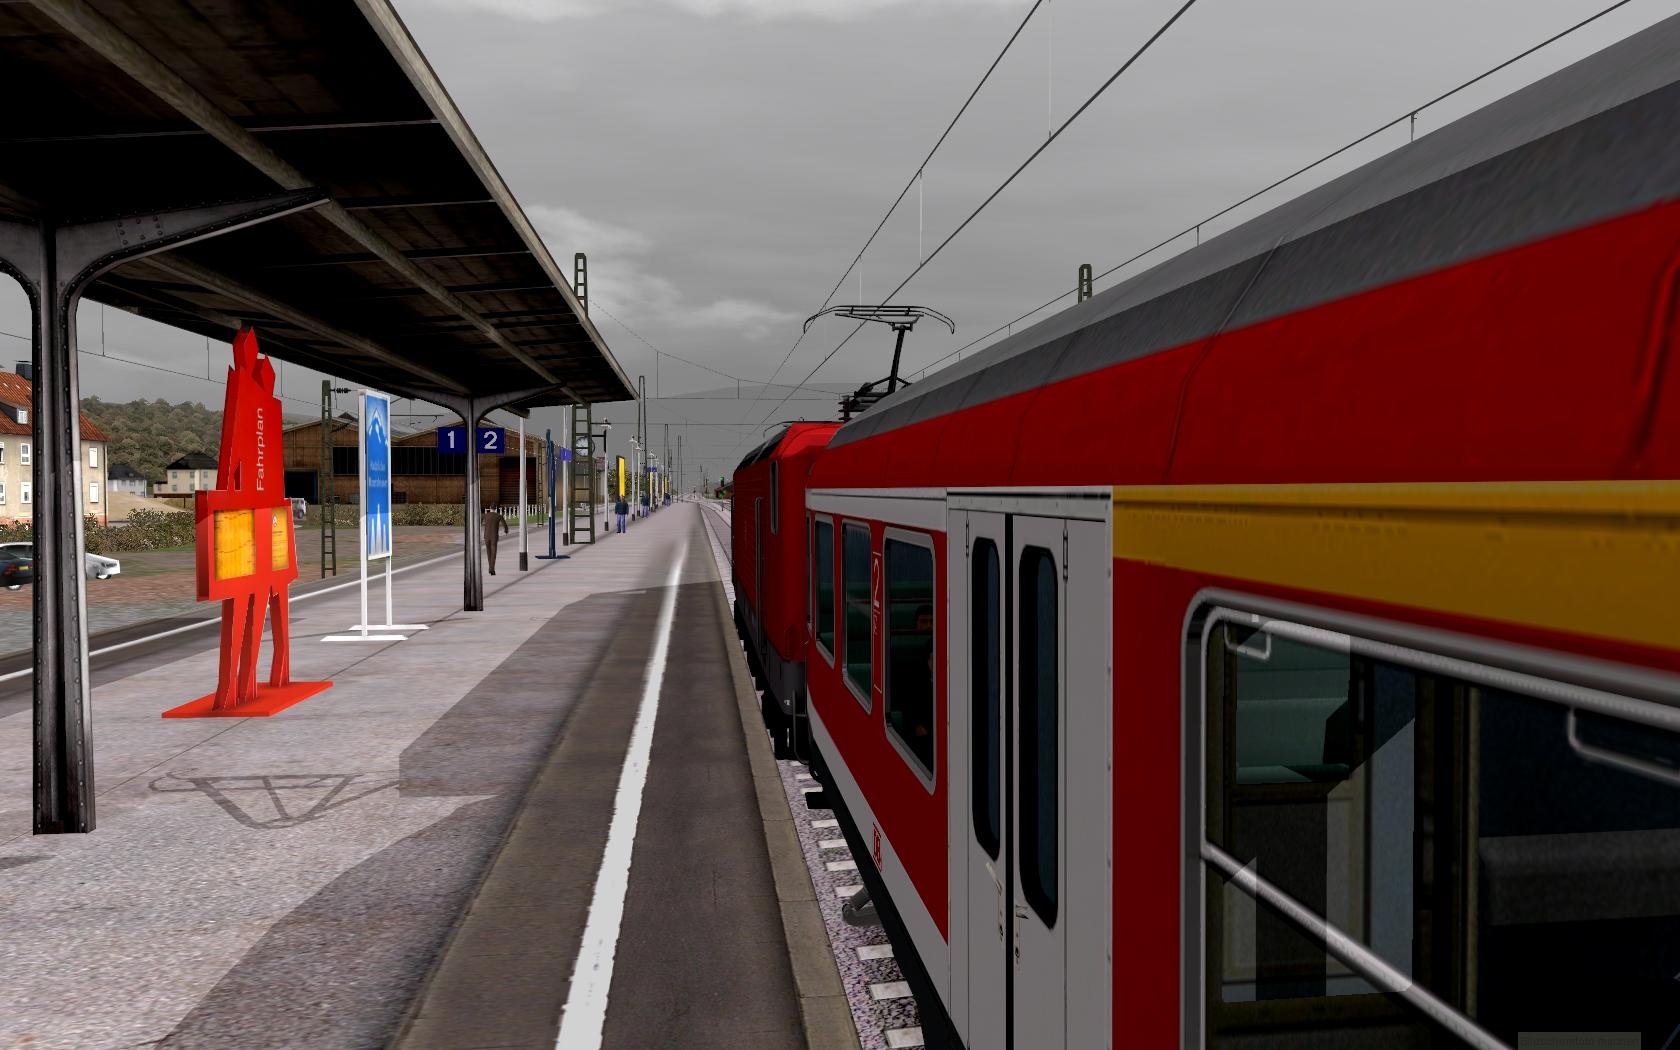 railworks 3 train simulator 2012 kostenlos spielen giga. Black Bedroom Furniture Sets. Home Design Ideas